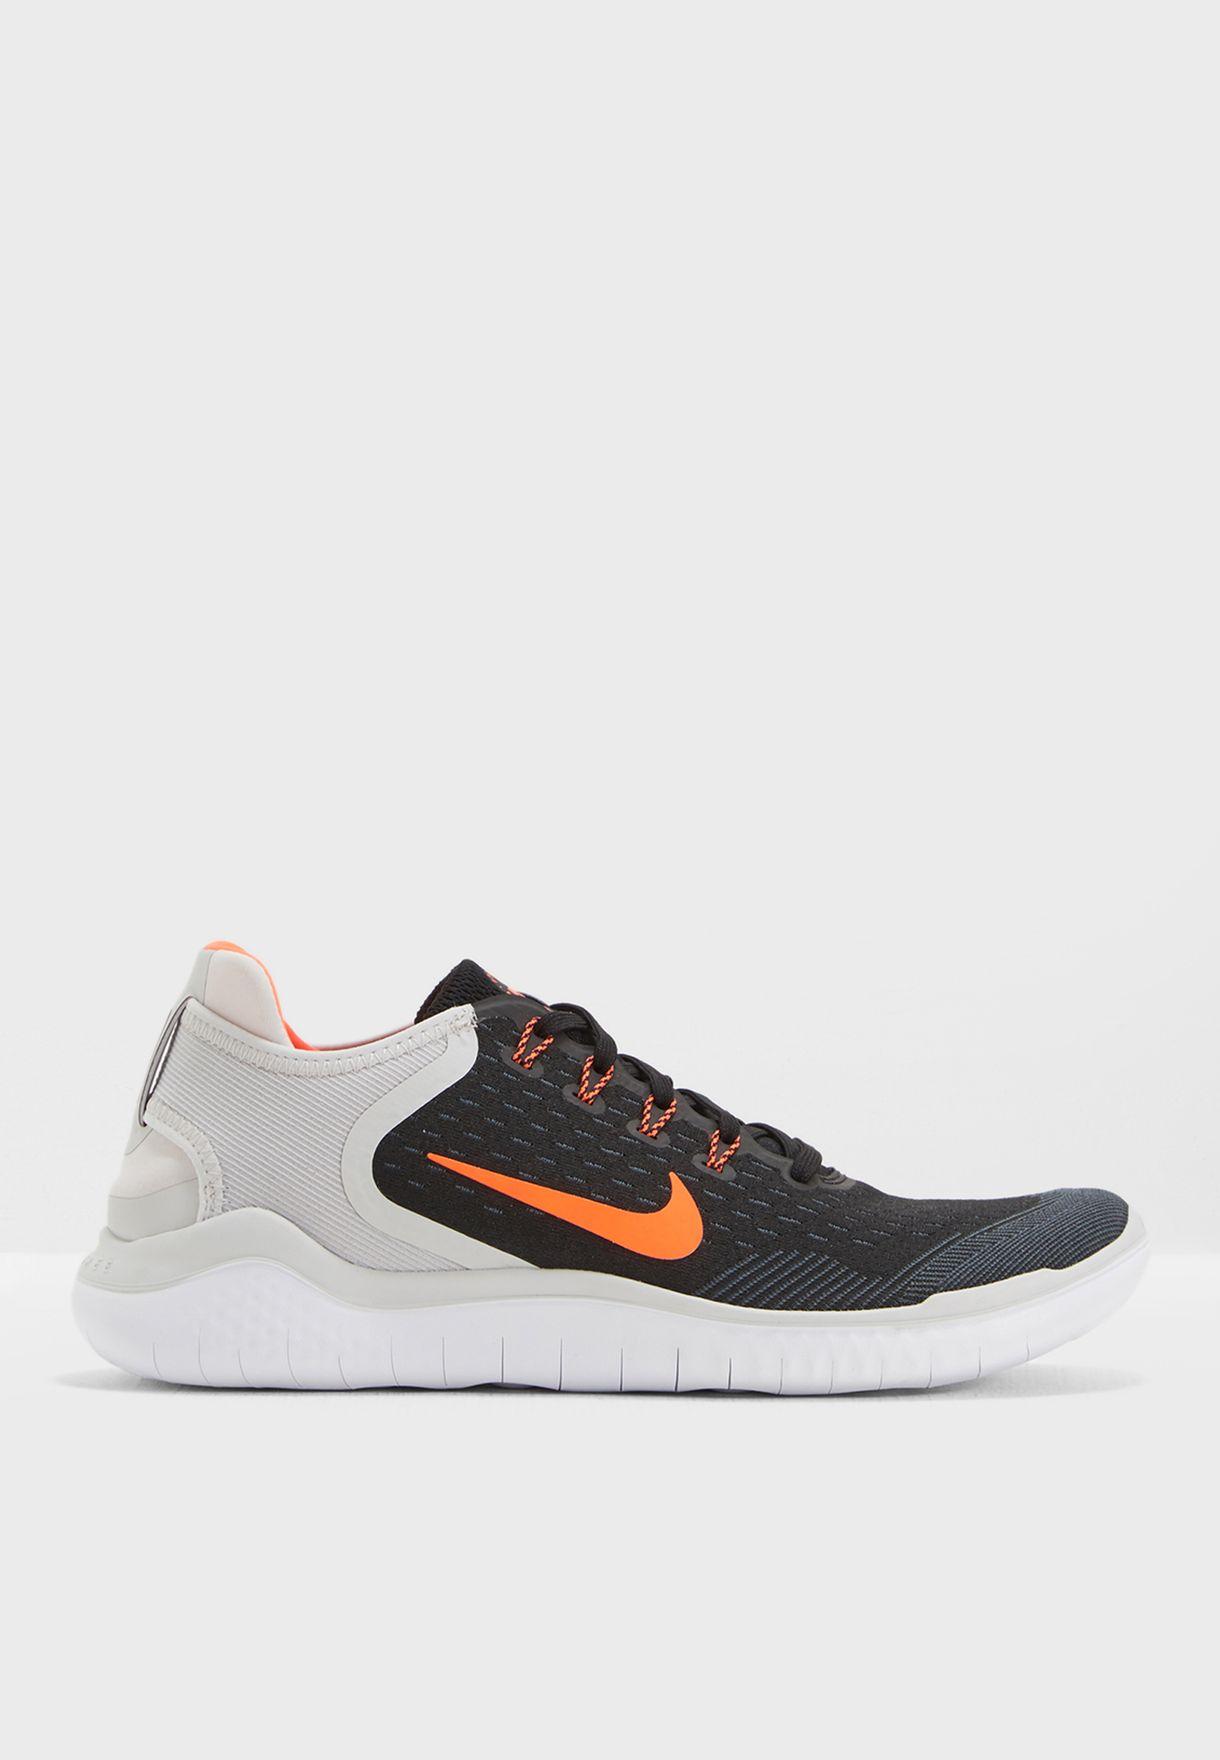 19e8bc344b83 Shop Nike multicolor Free RN 2018 942836-005 for Men in UAE ...